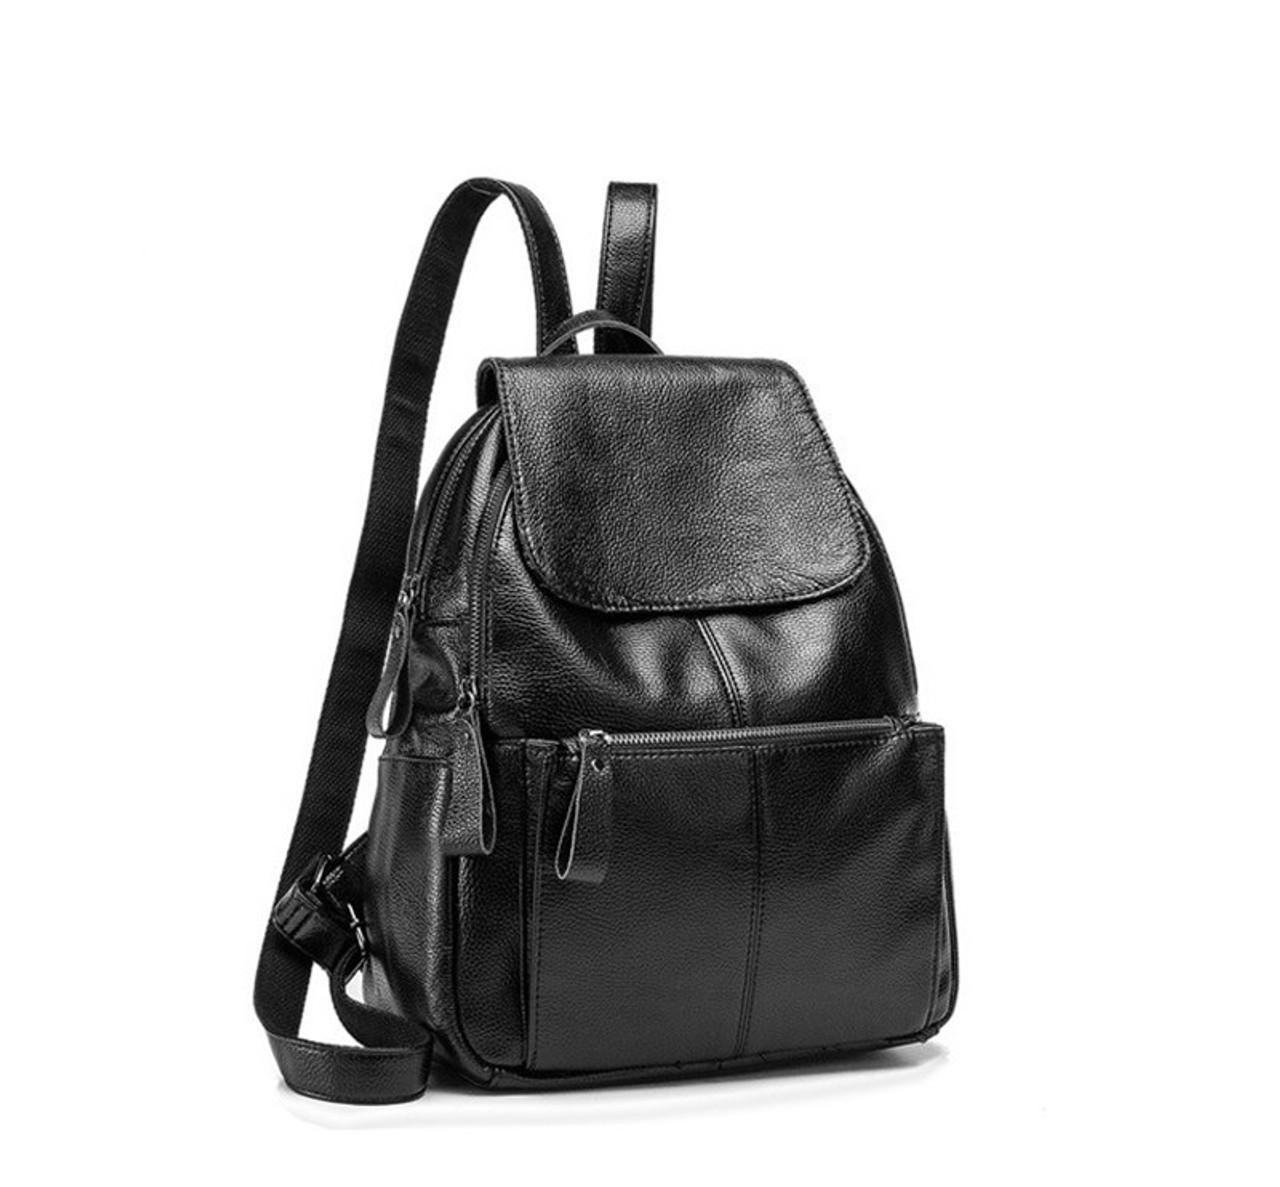 242195811884 New Fashion Casual Women Backpack Female Leather Women's Backpacks Black  Bagpack Bags Girls Schoolbag Travel Bag back pack